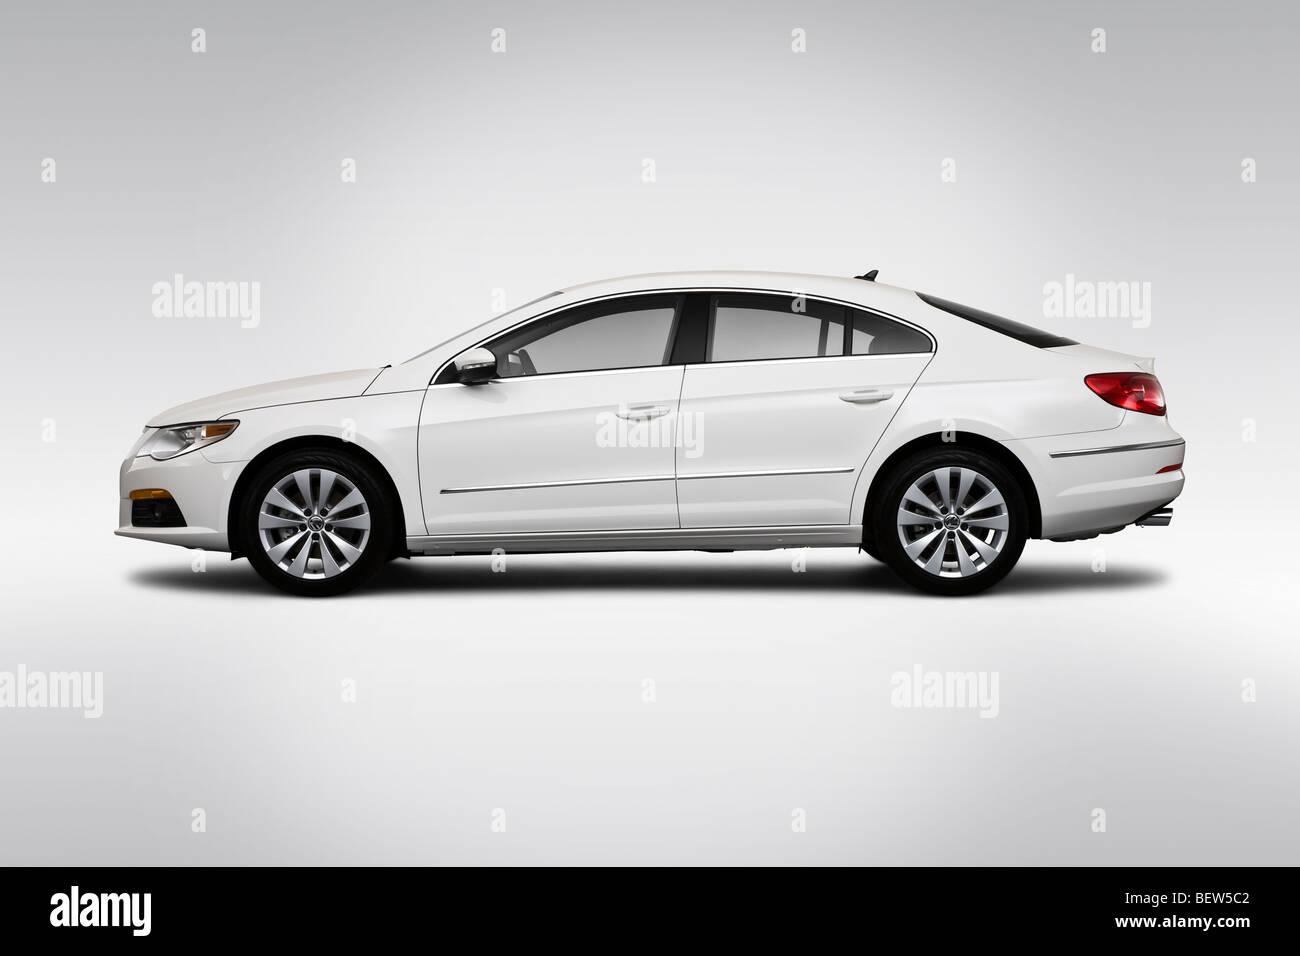 2010 Volkswagen CC Sport in White - Drivers Side Profile Stock Photo